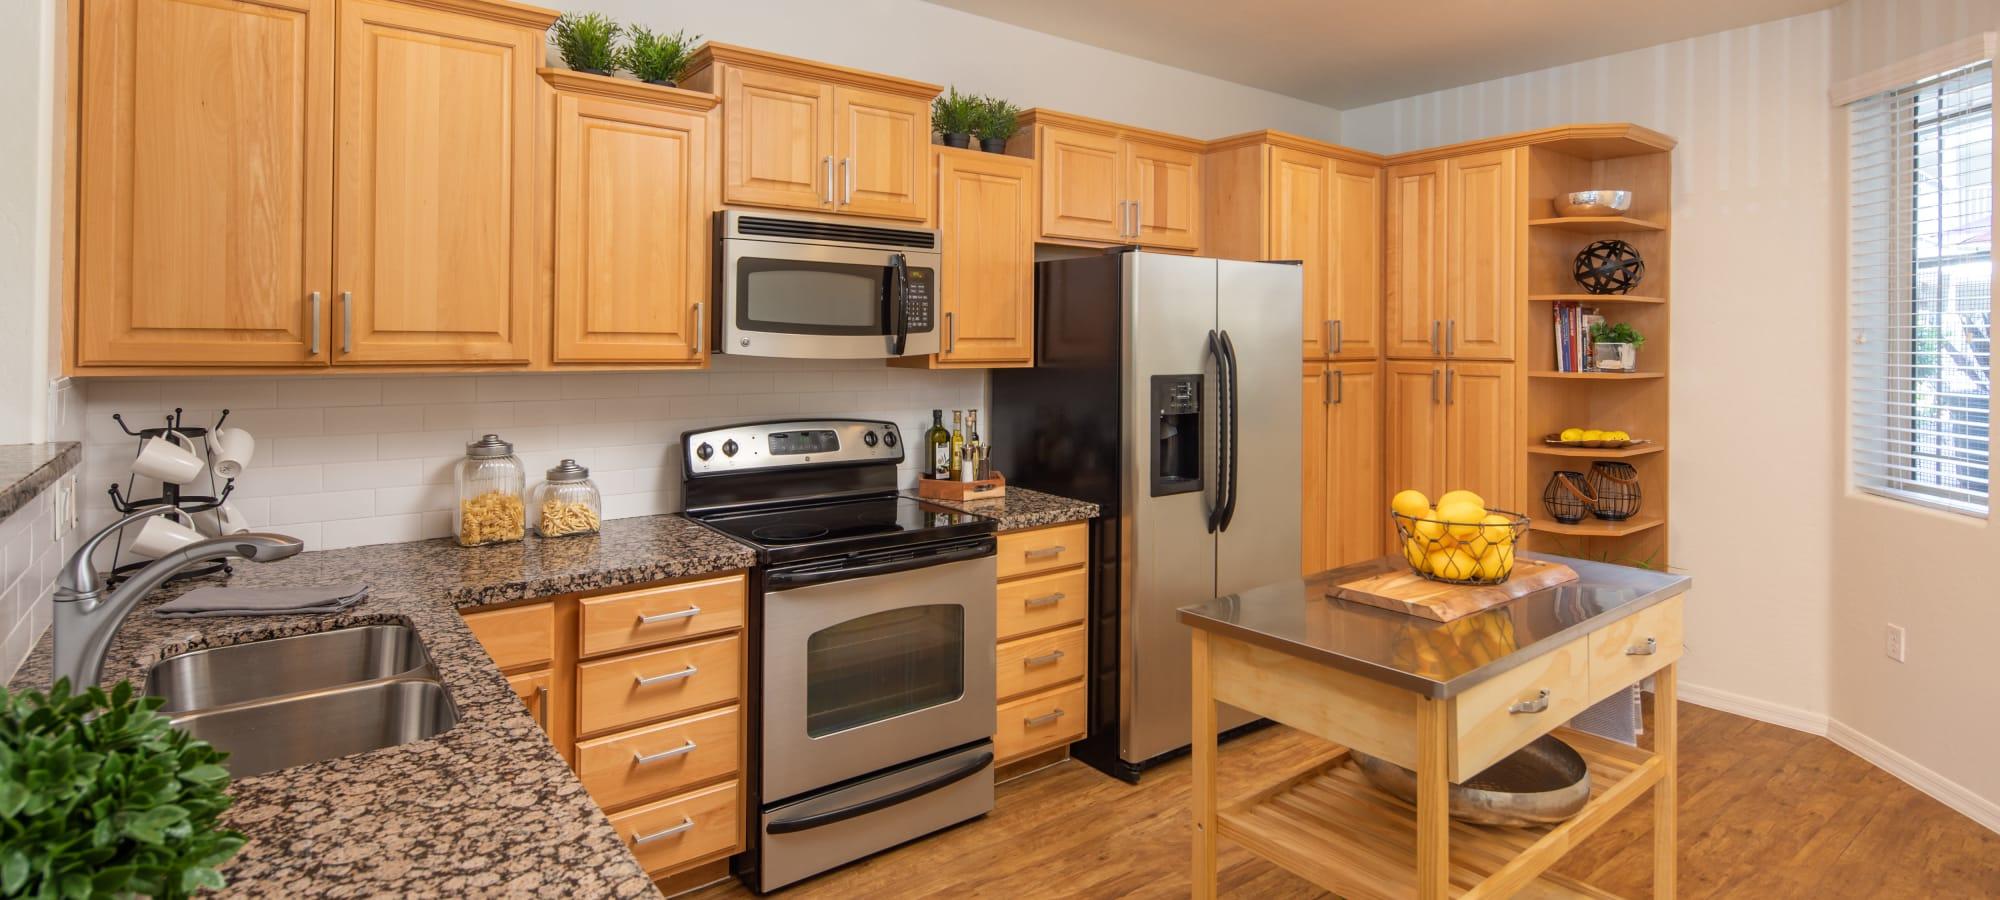 Quaint kitchen at The Fleetwood in Tempe, Arizona